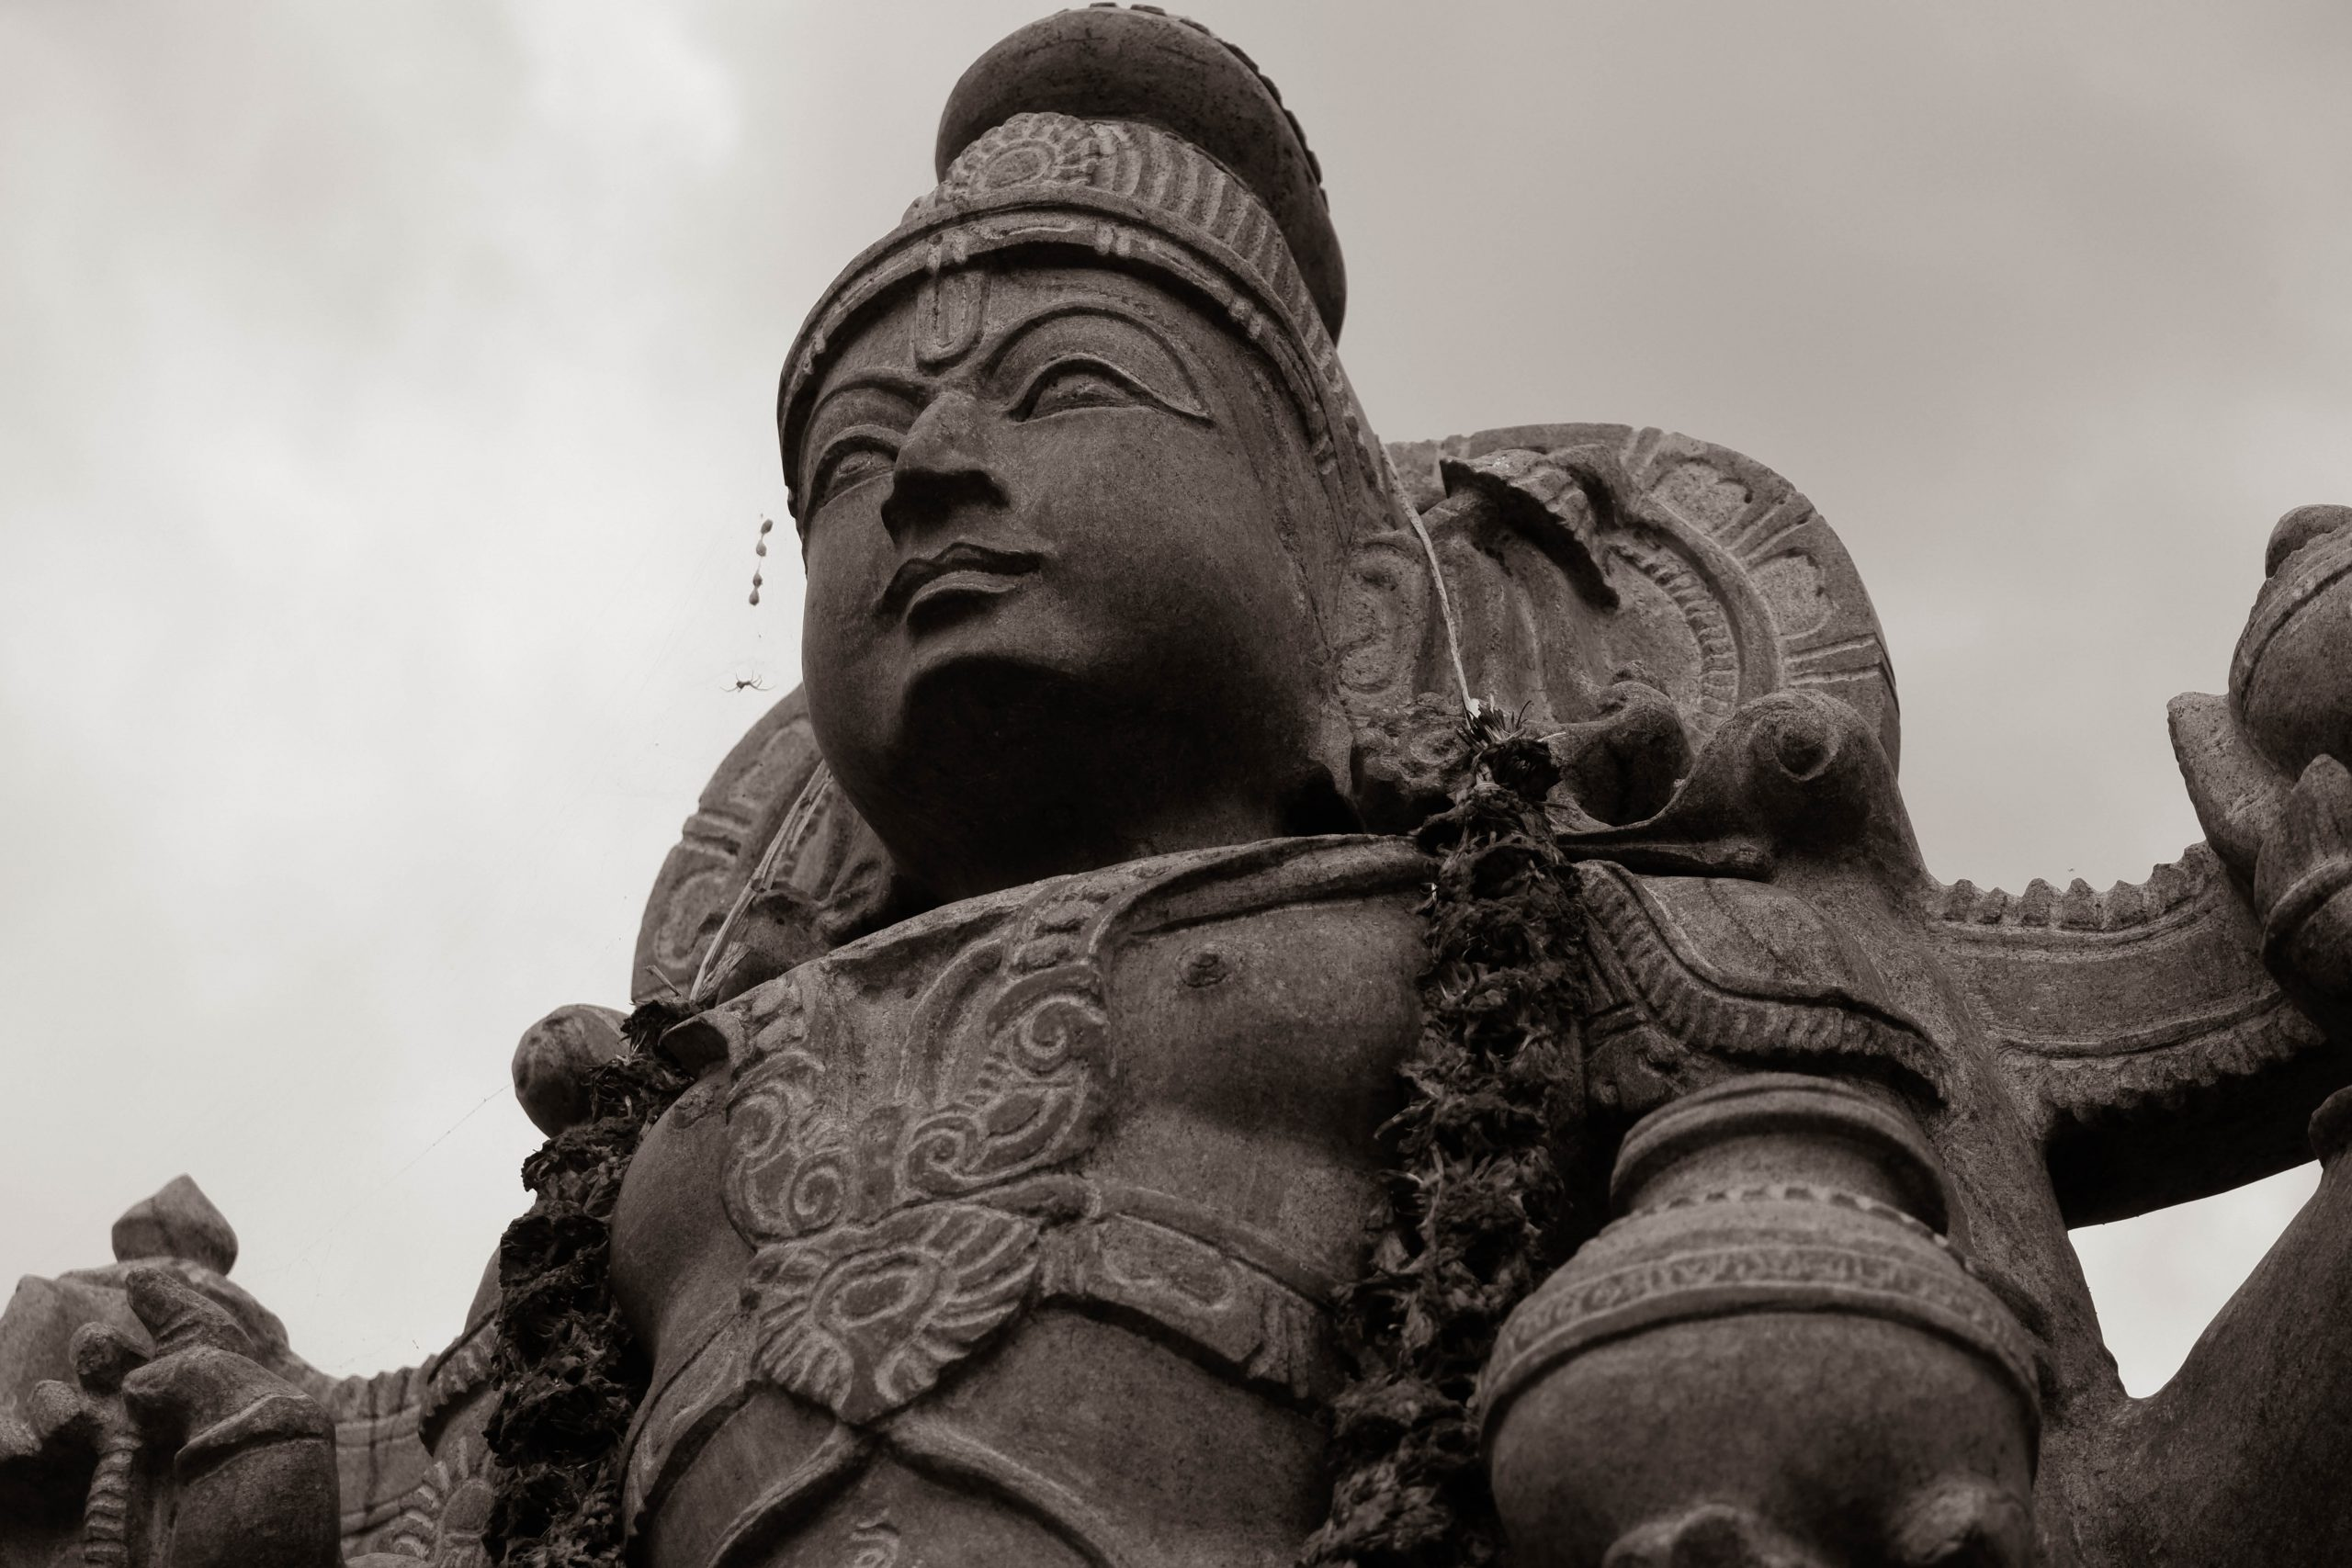 Rock statue of Hindu Goddess